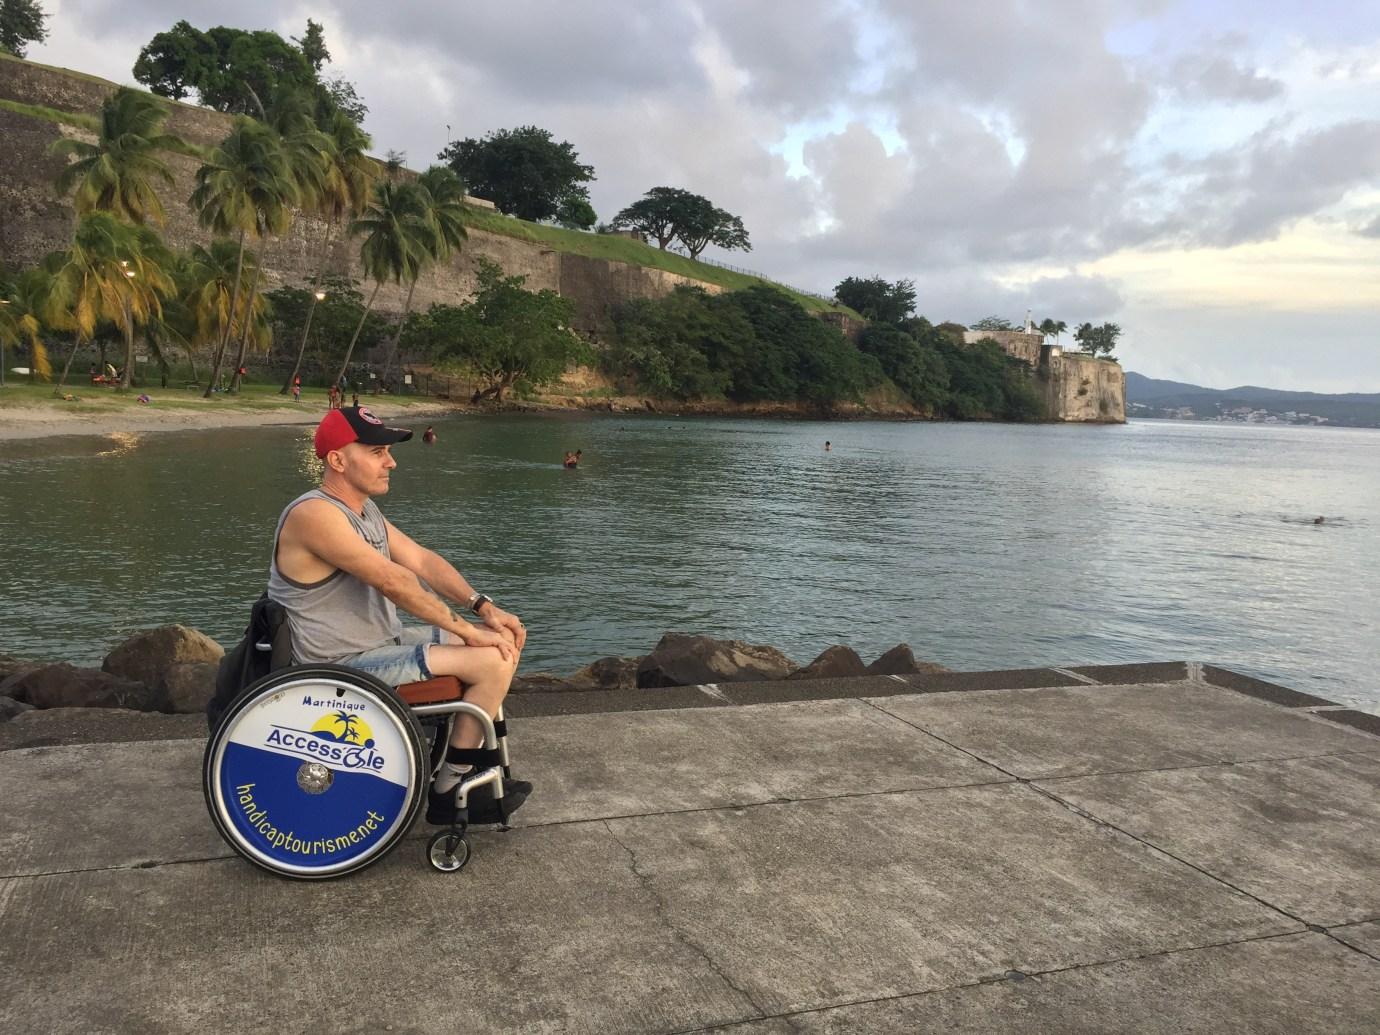 Martinique Access Ile Noel Cicalini